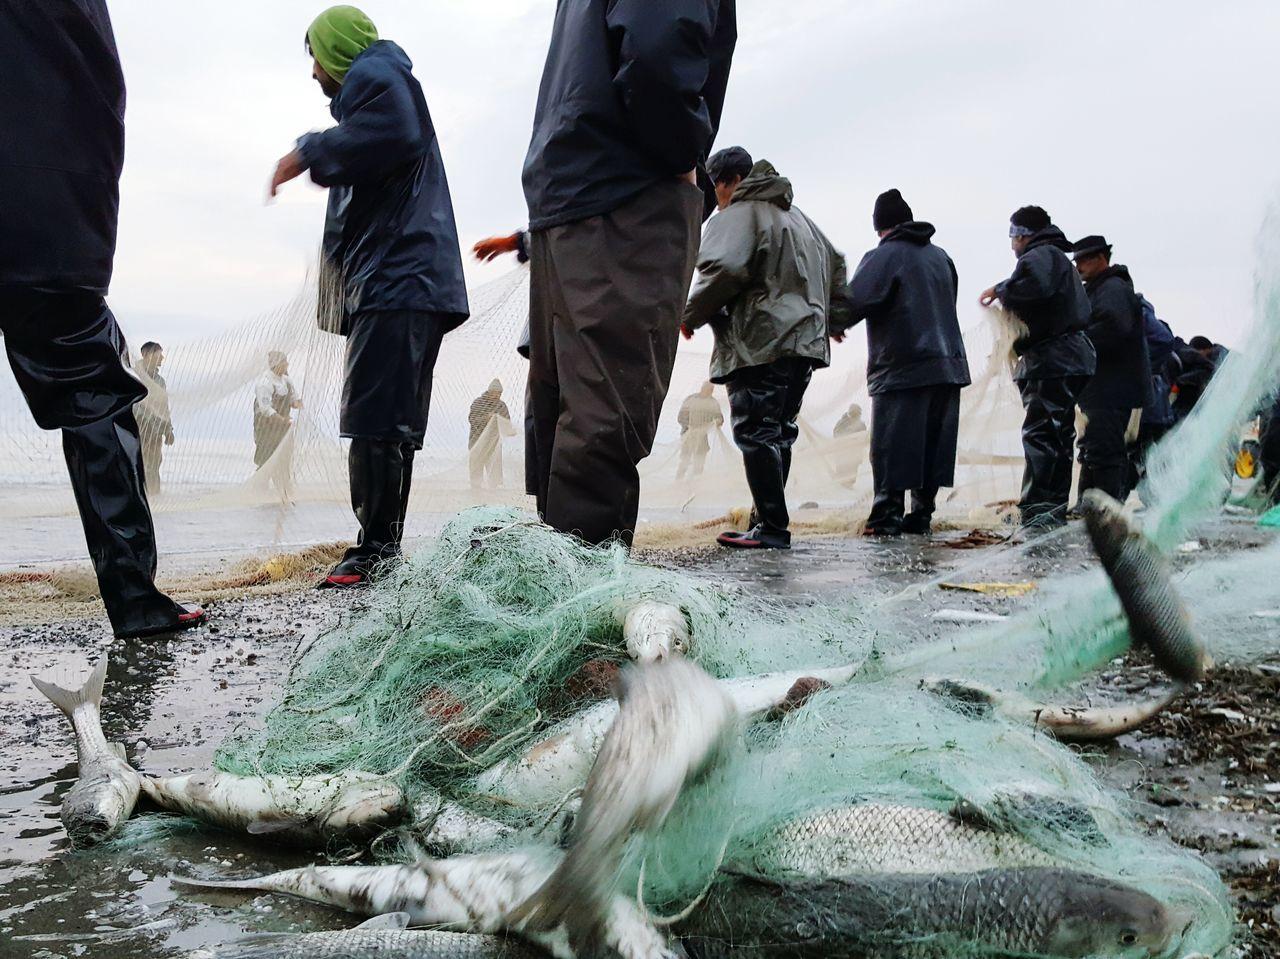 Photography In Motion Fishing Anzali,gilan, Iran Samsung Galaxy Note 5 Caspian Sea